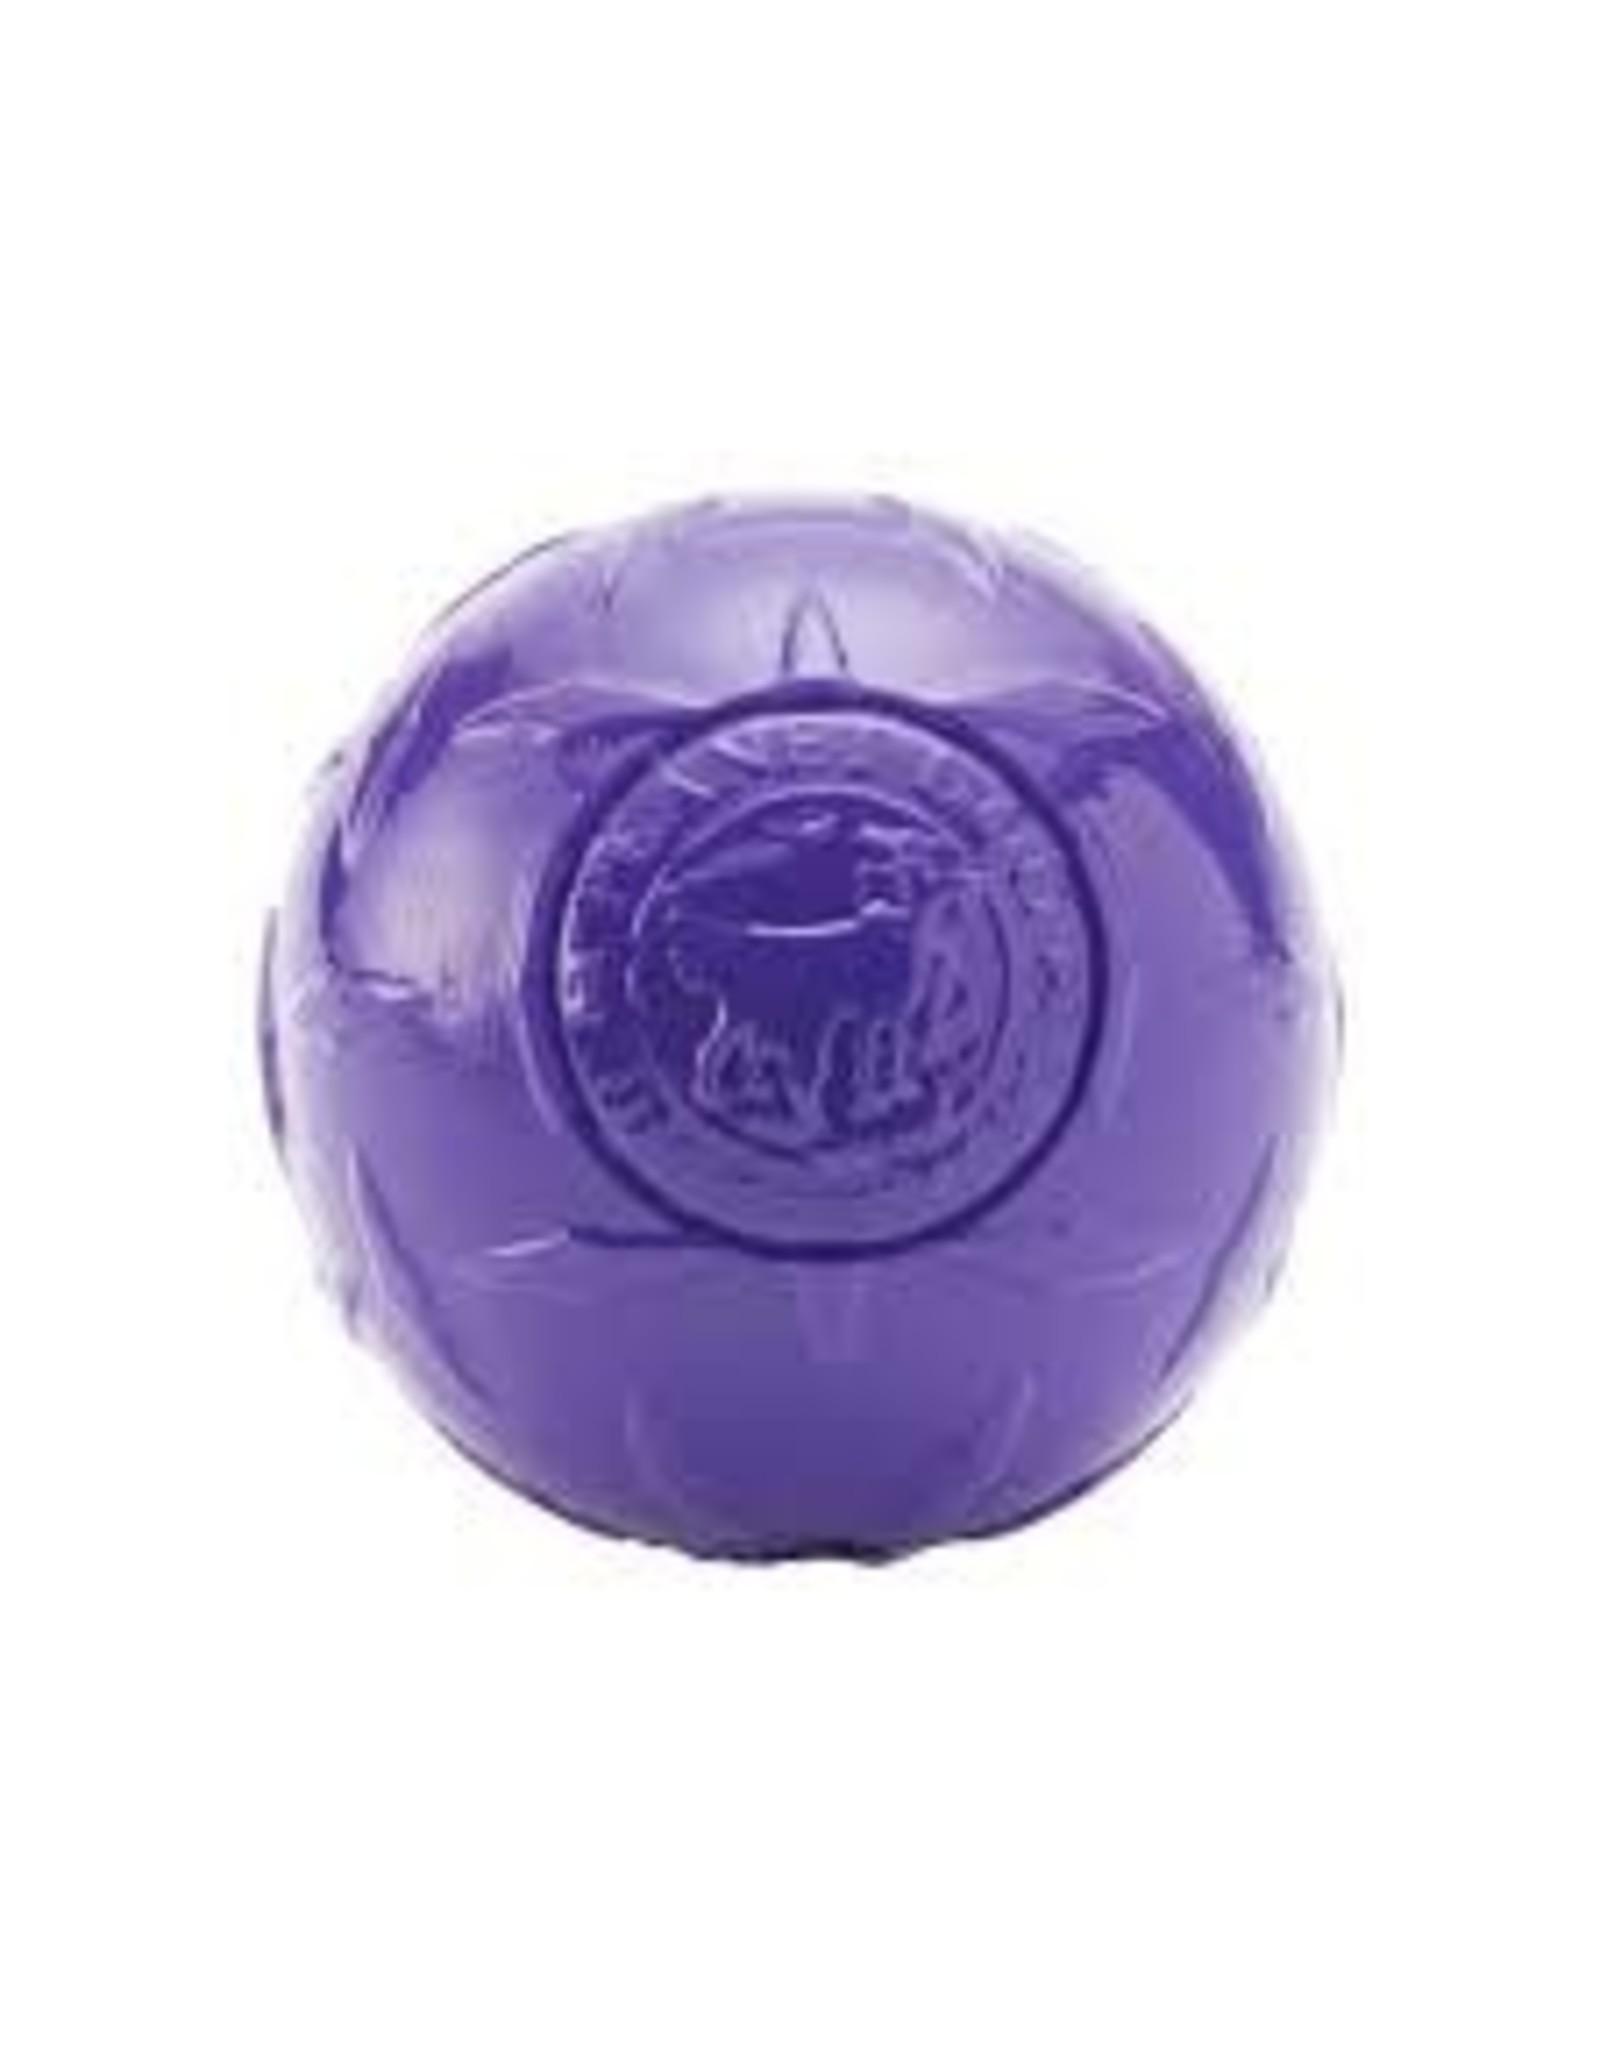 Planet Dog Planet Dog Diamond Plate Ball: Purple, 4 inch